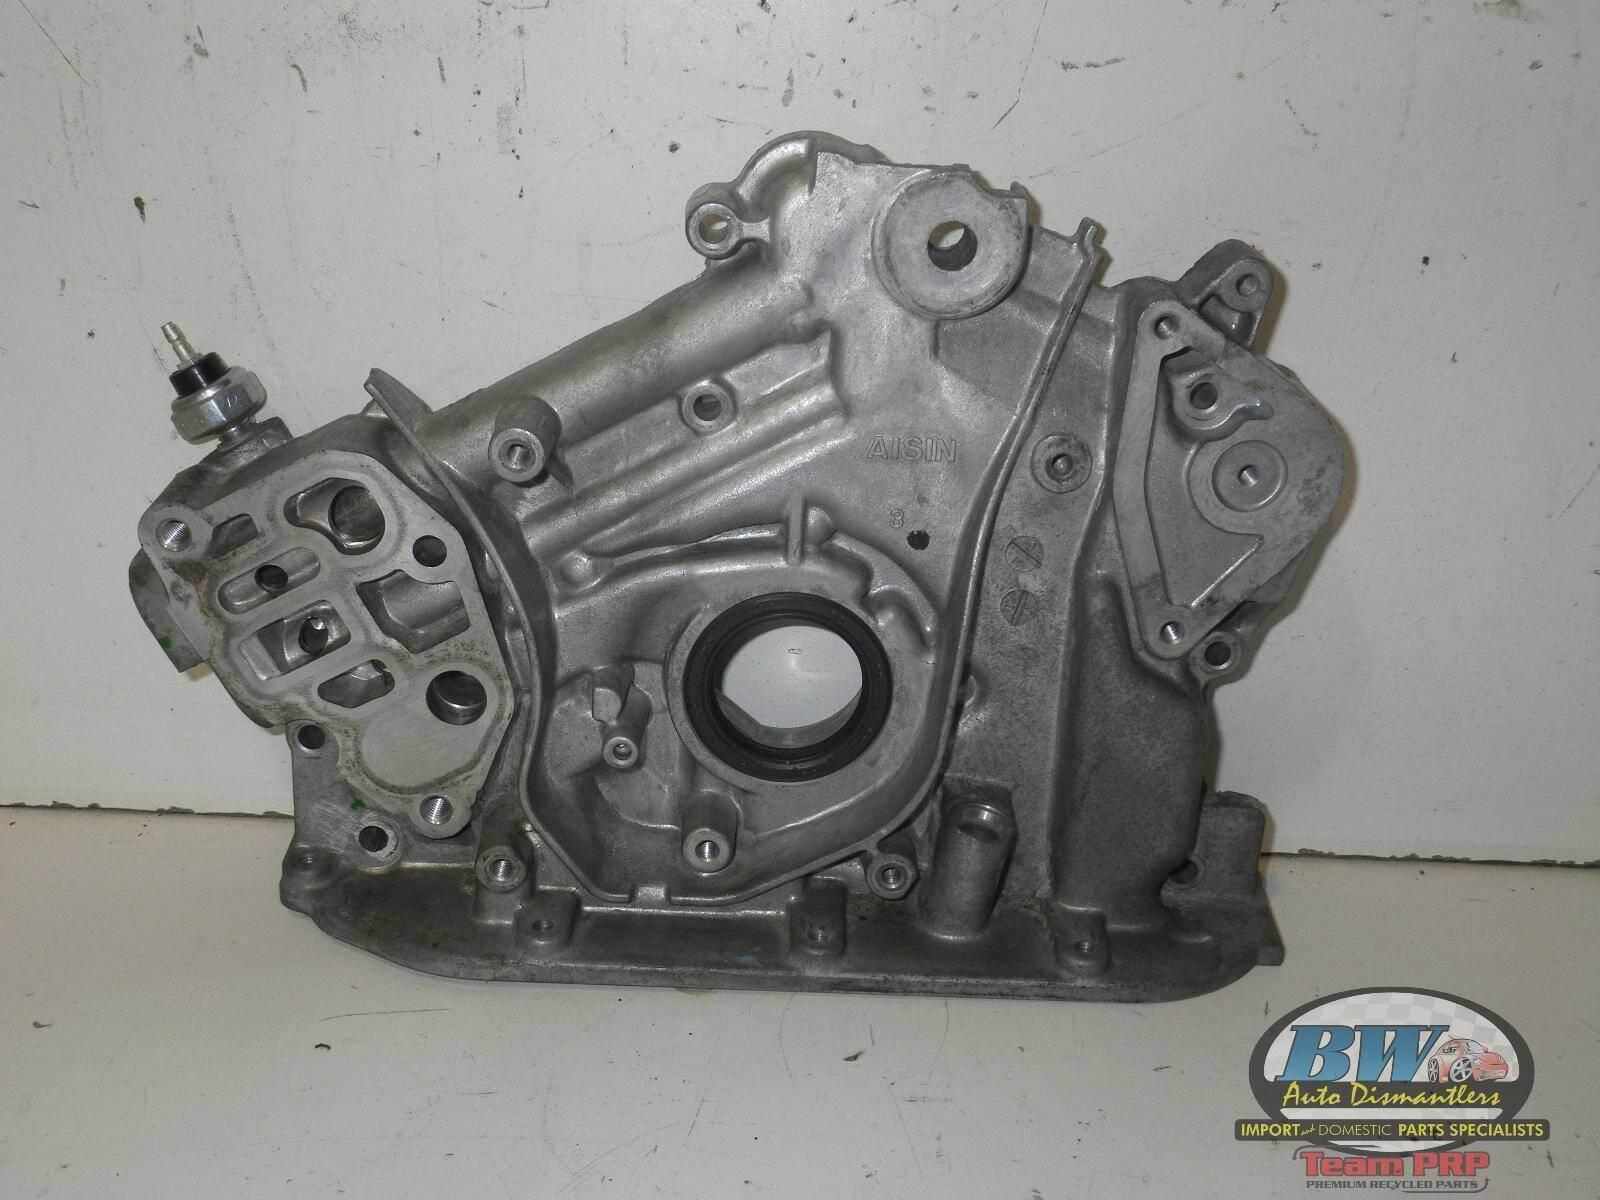 1998 Acura Rl Engine Diagram Engine Car Parts And Component Diagram